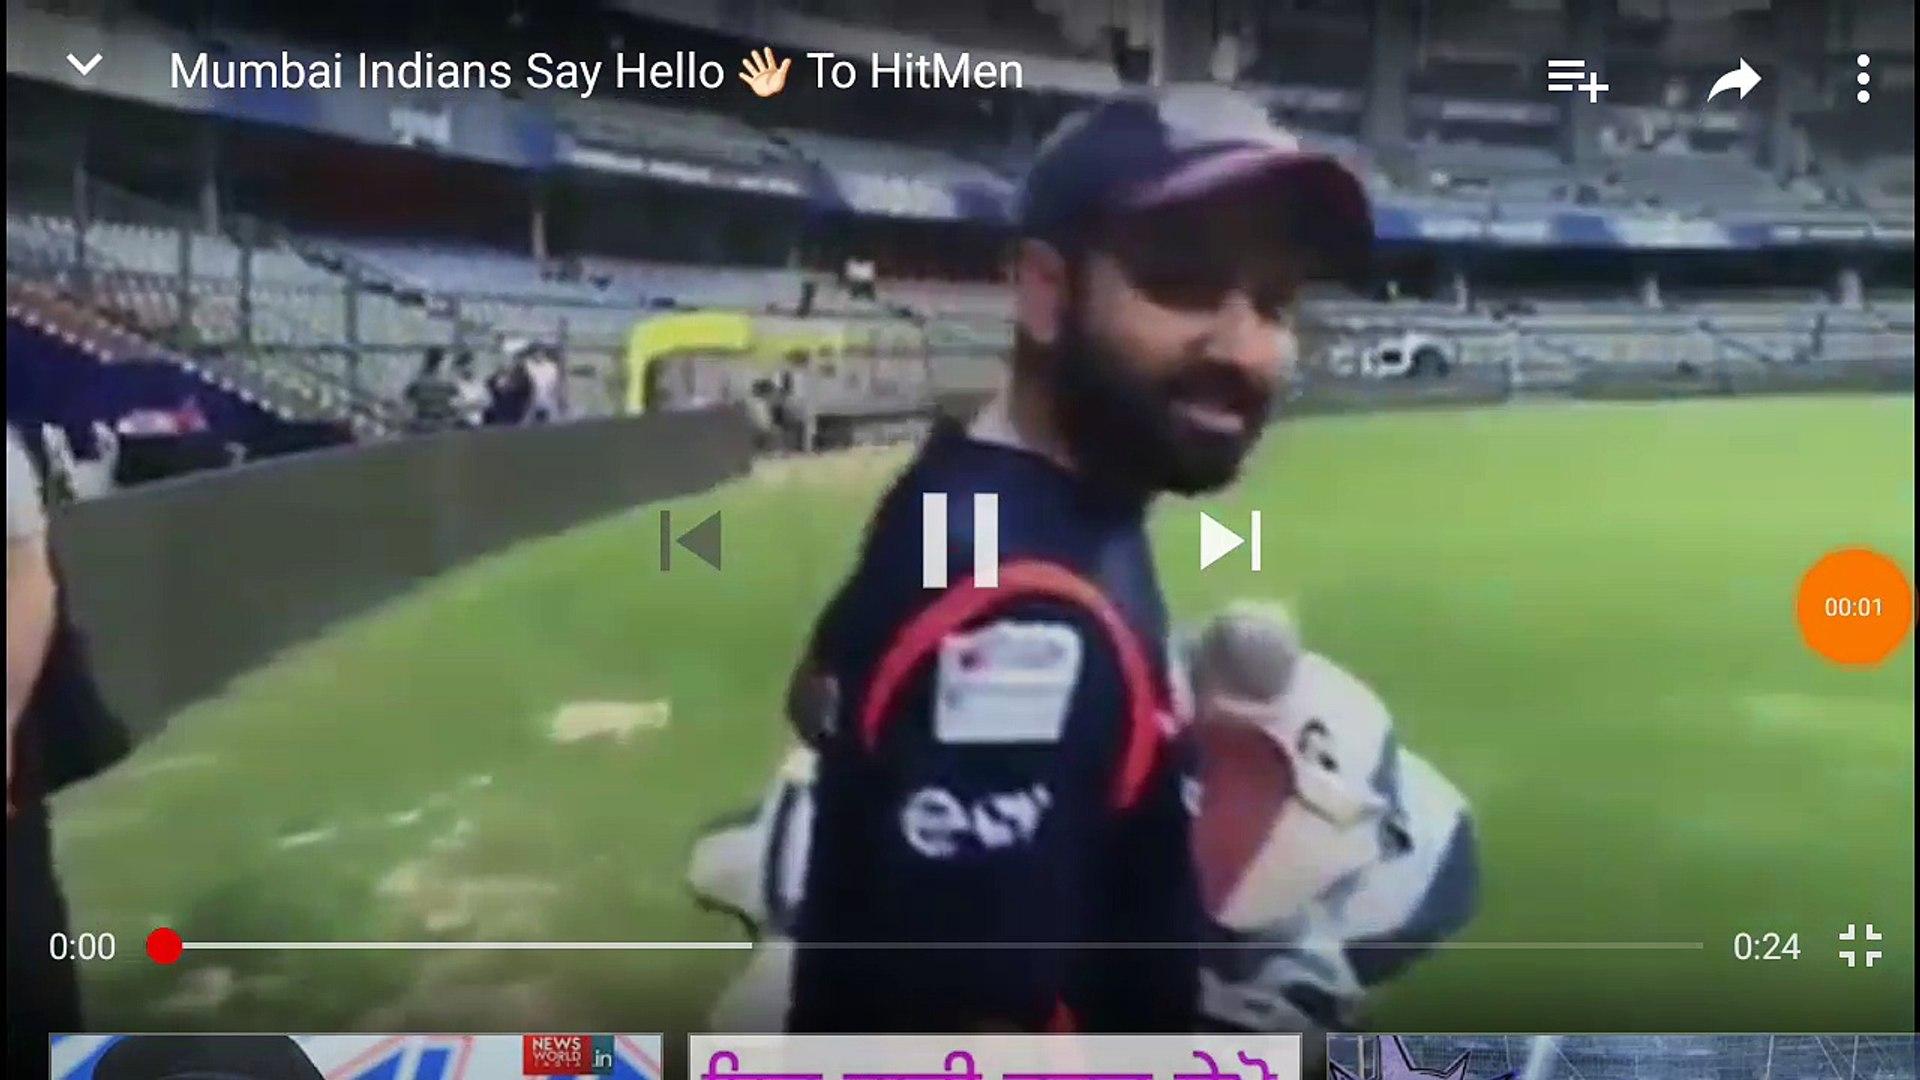 IPL 2018 Mumbai Indian vs csk highlights.  Rohit Sharma net batting vedio.  Rohit Sharma 265 run hig